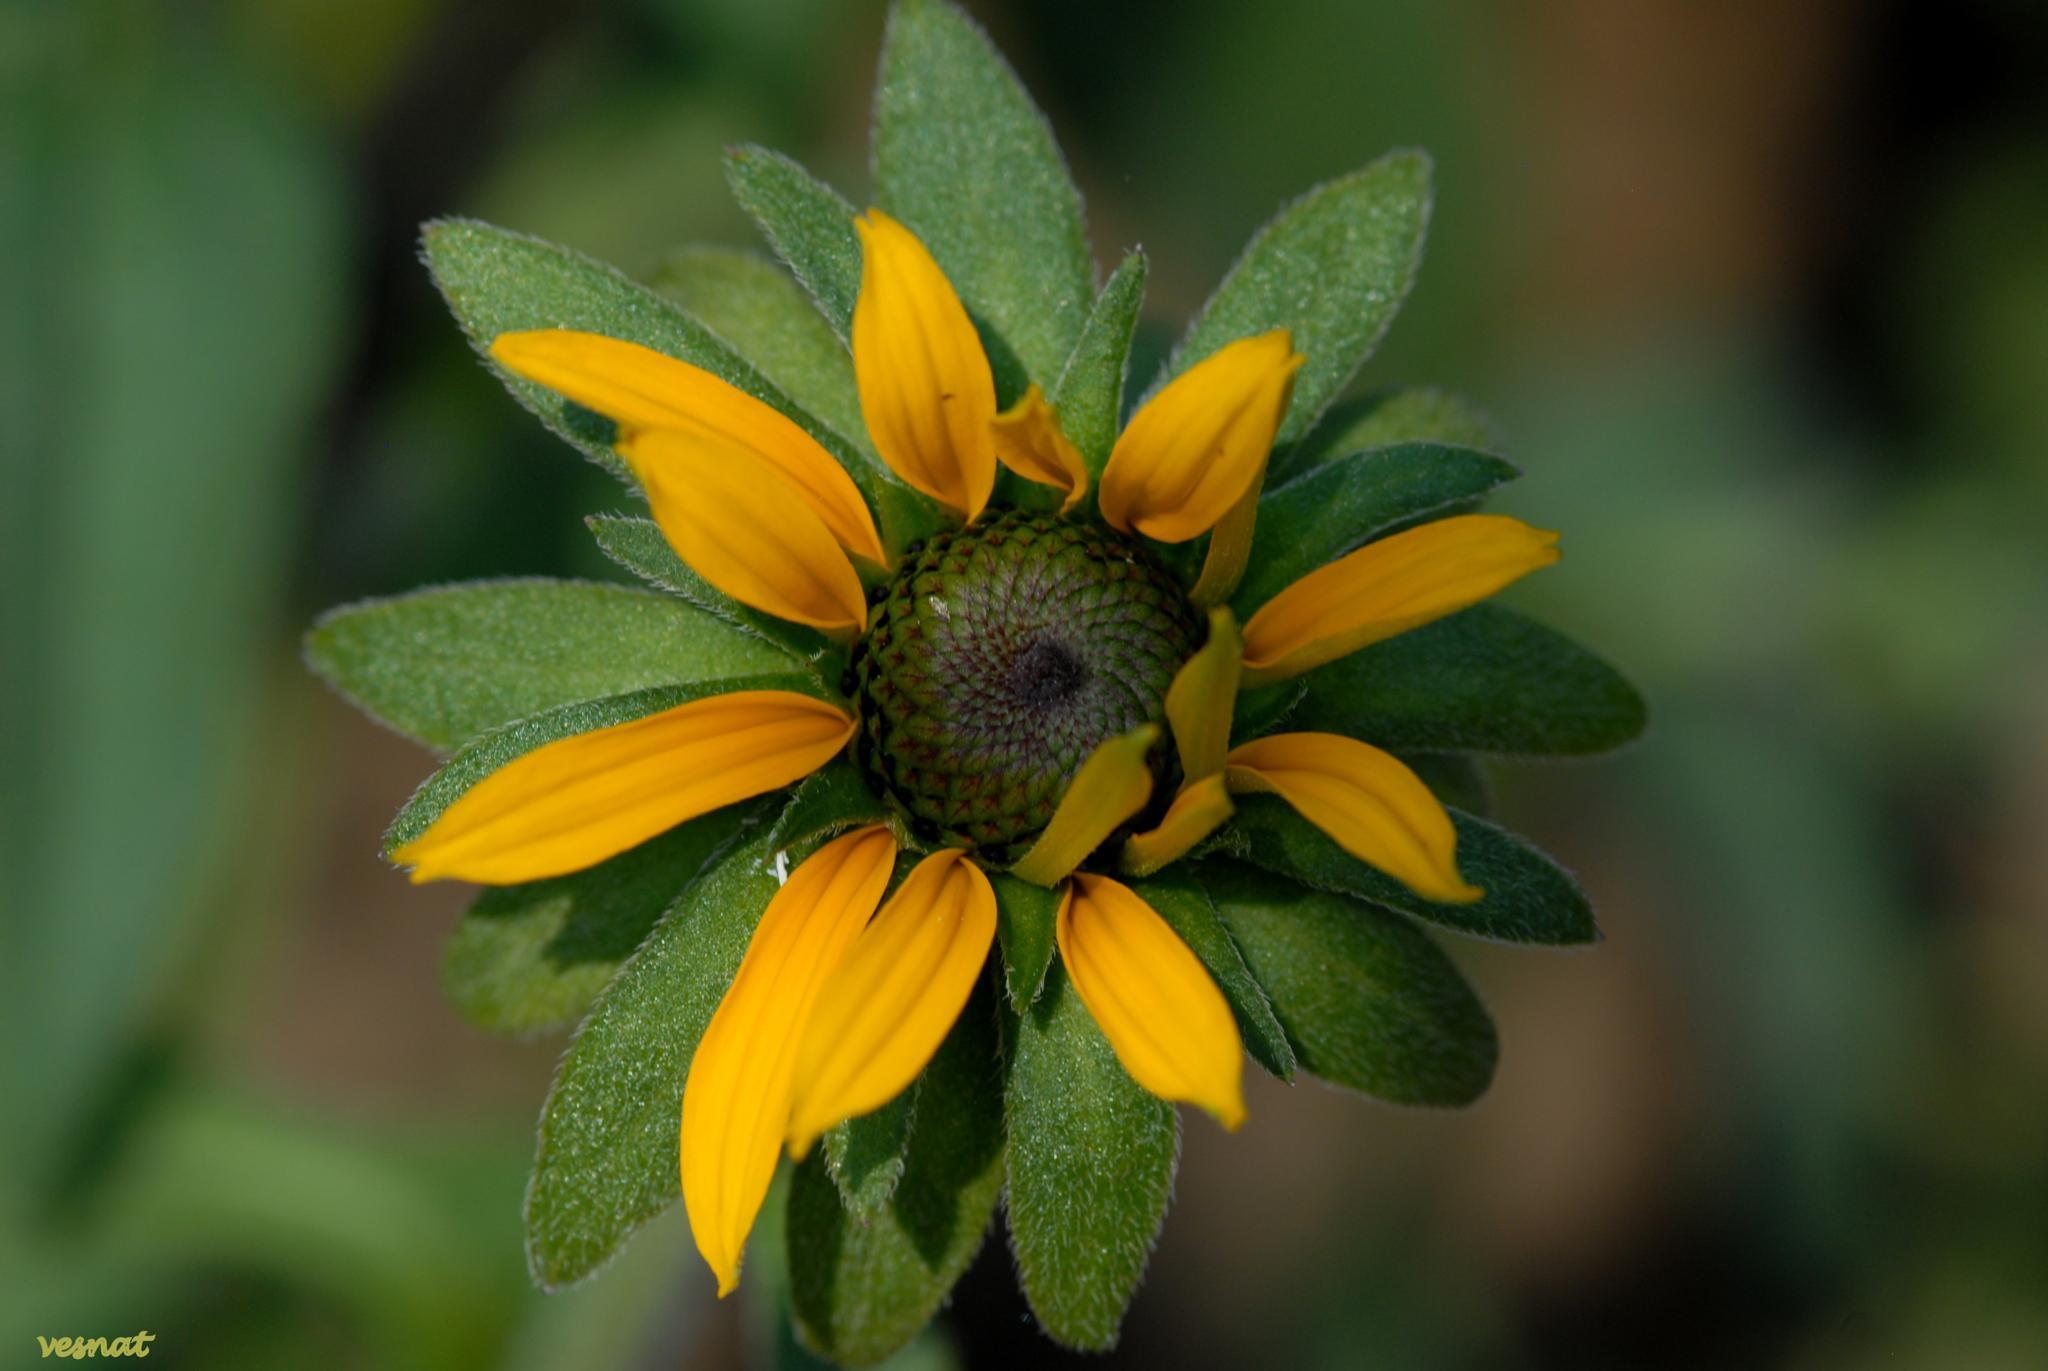 I will be a flower by vesna.tafra